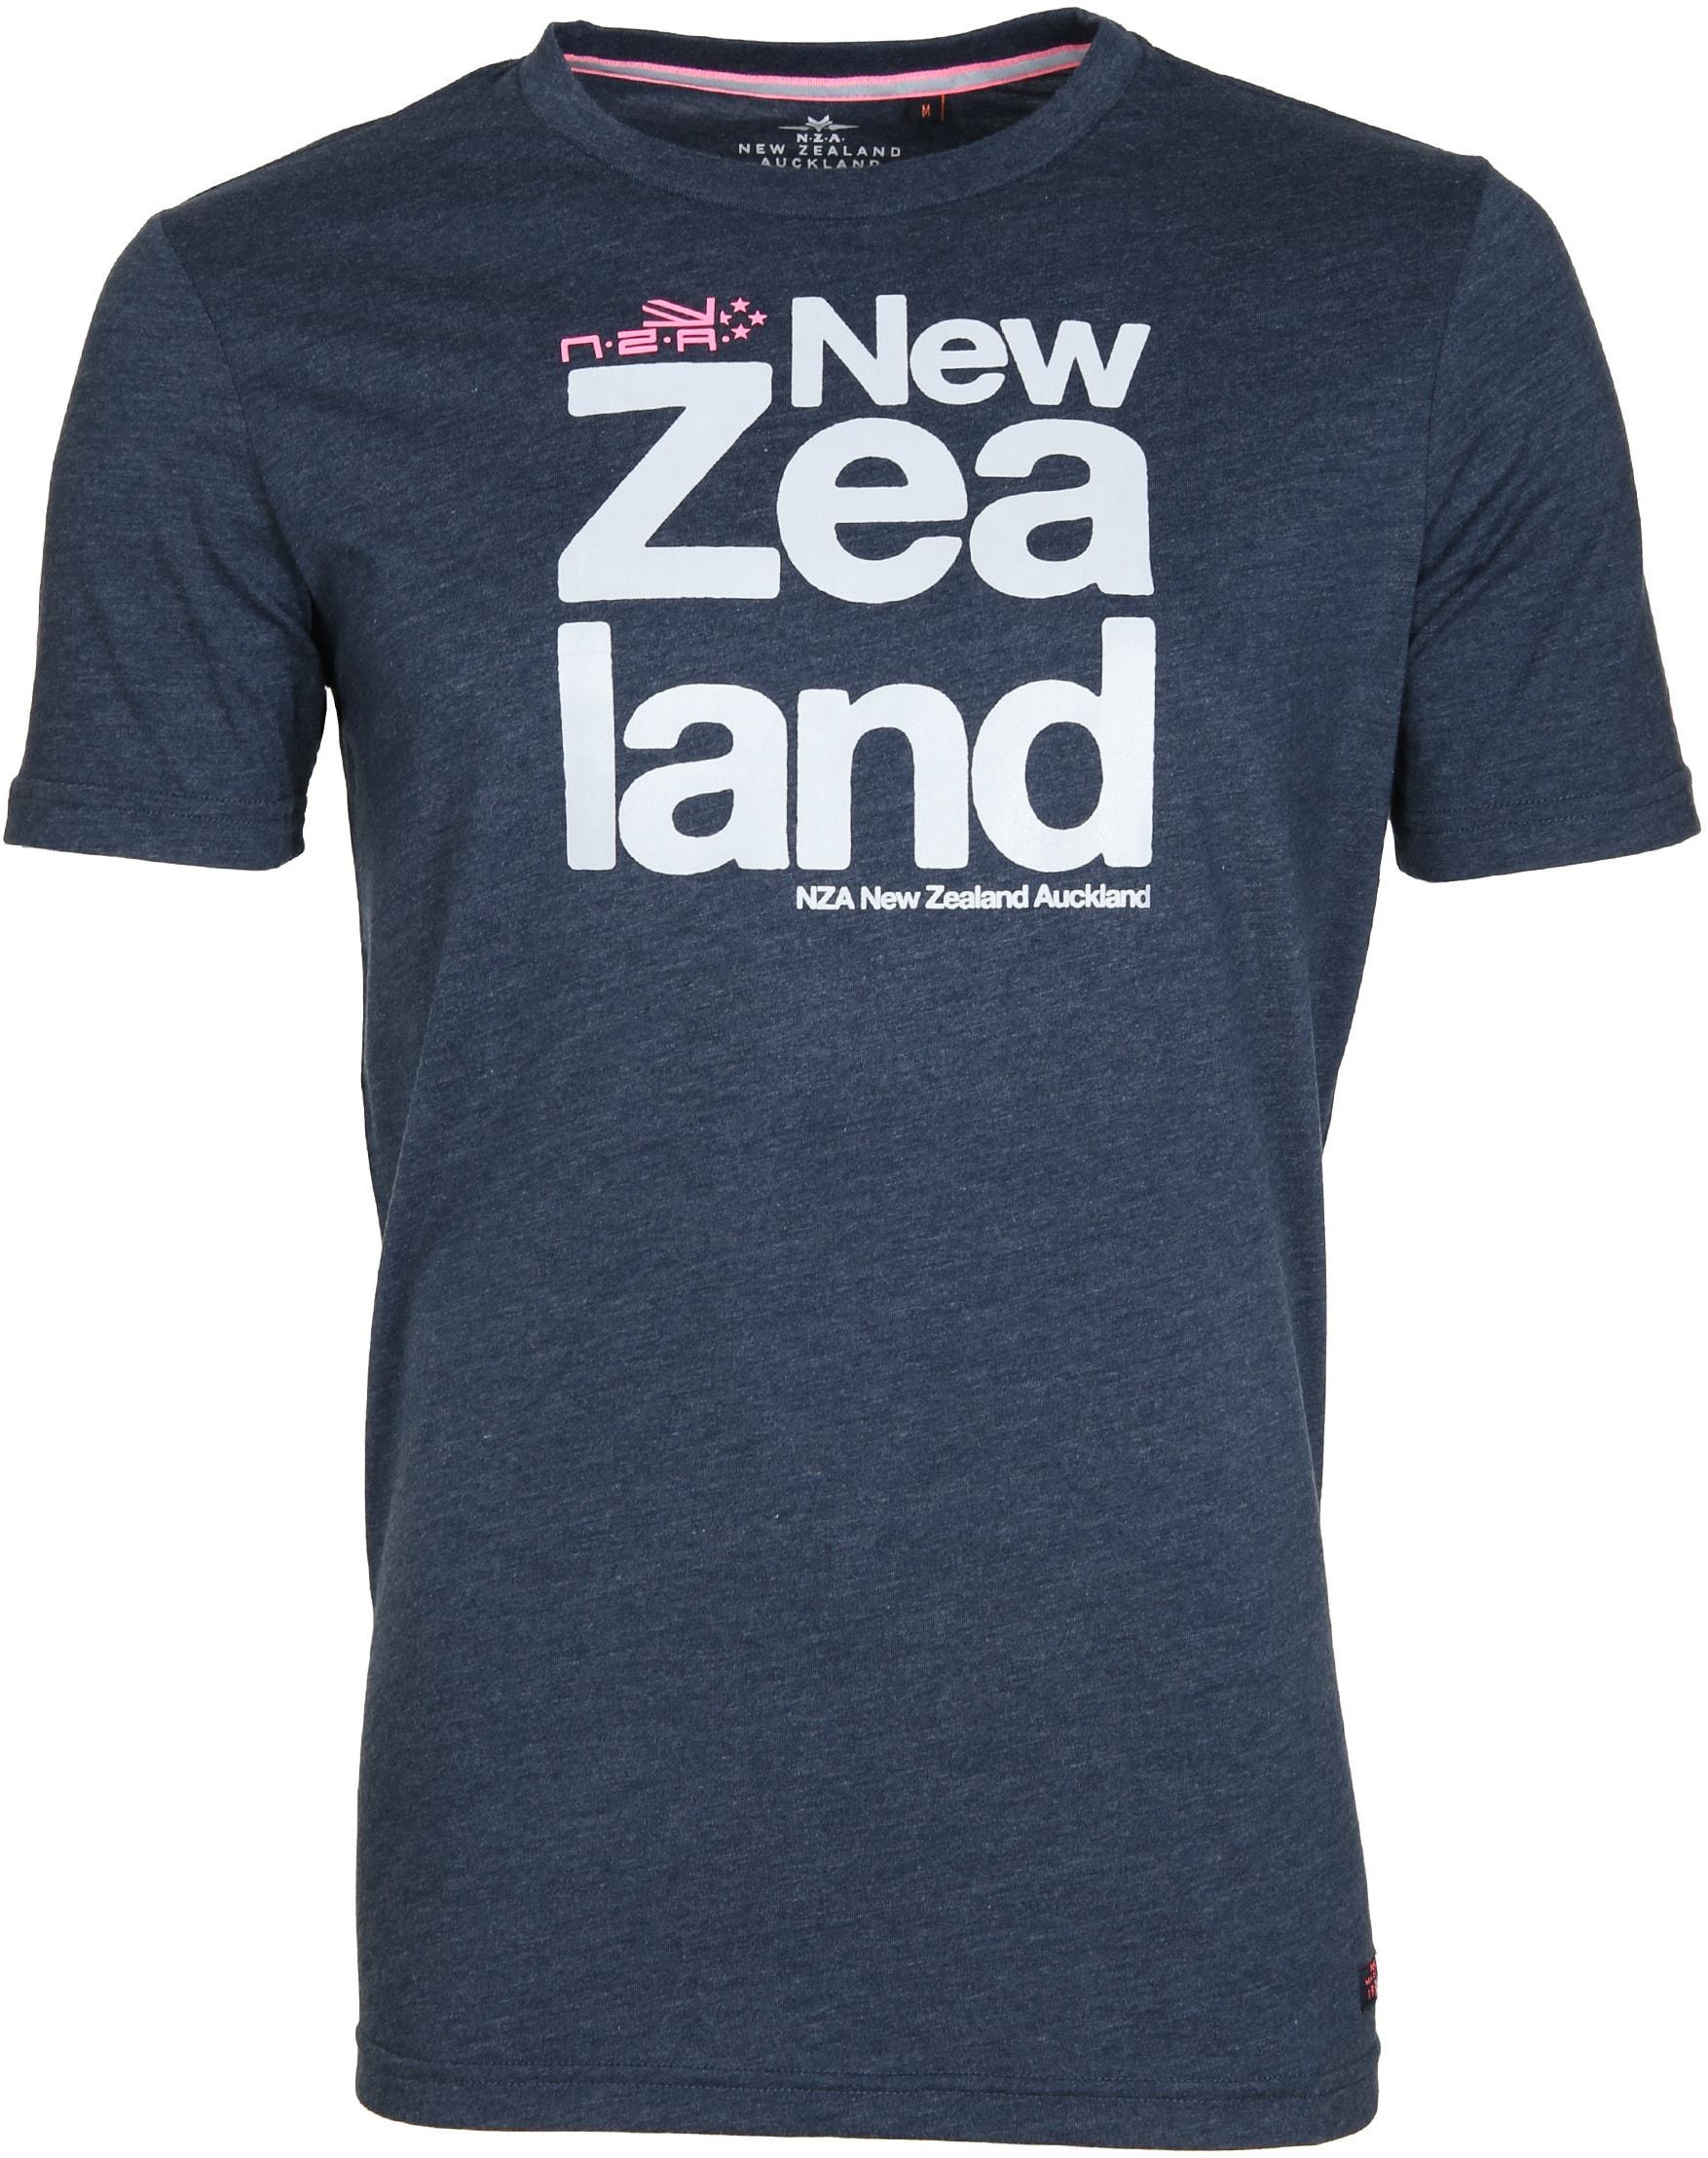 NZA Dampier T-shirt Dunkelblau foto 0